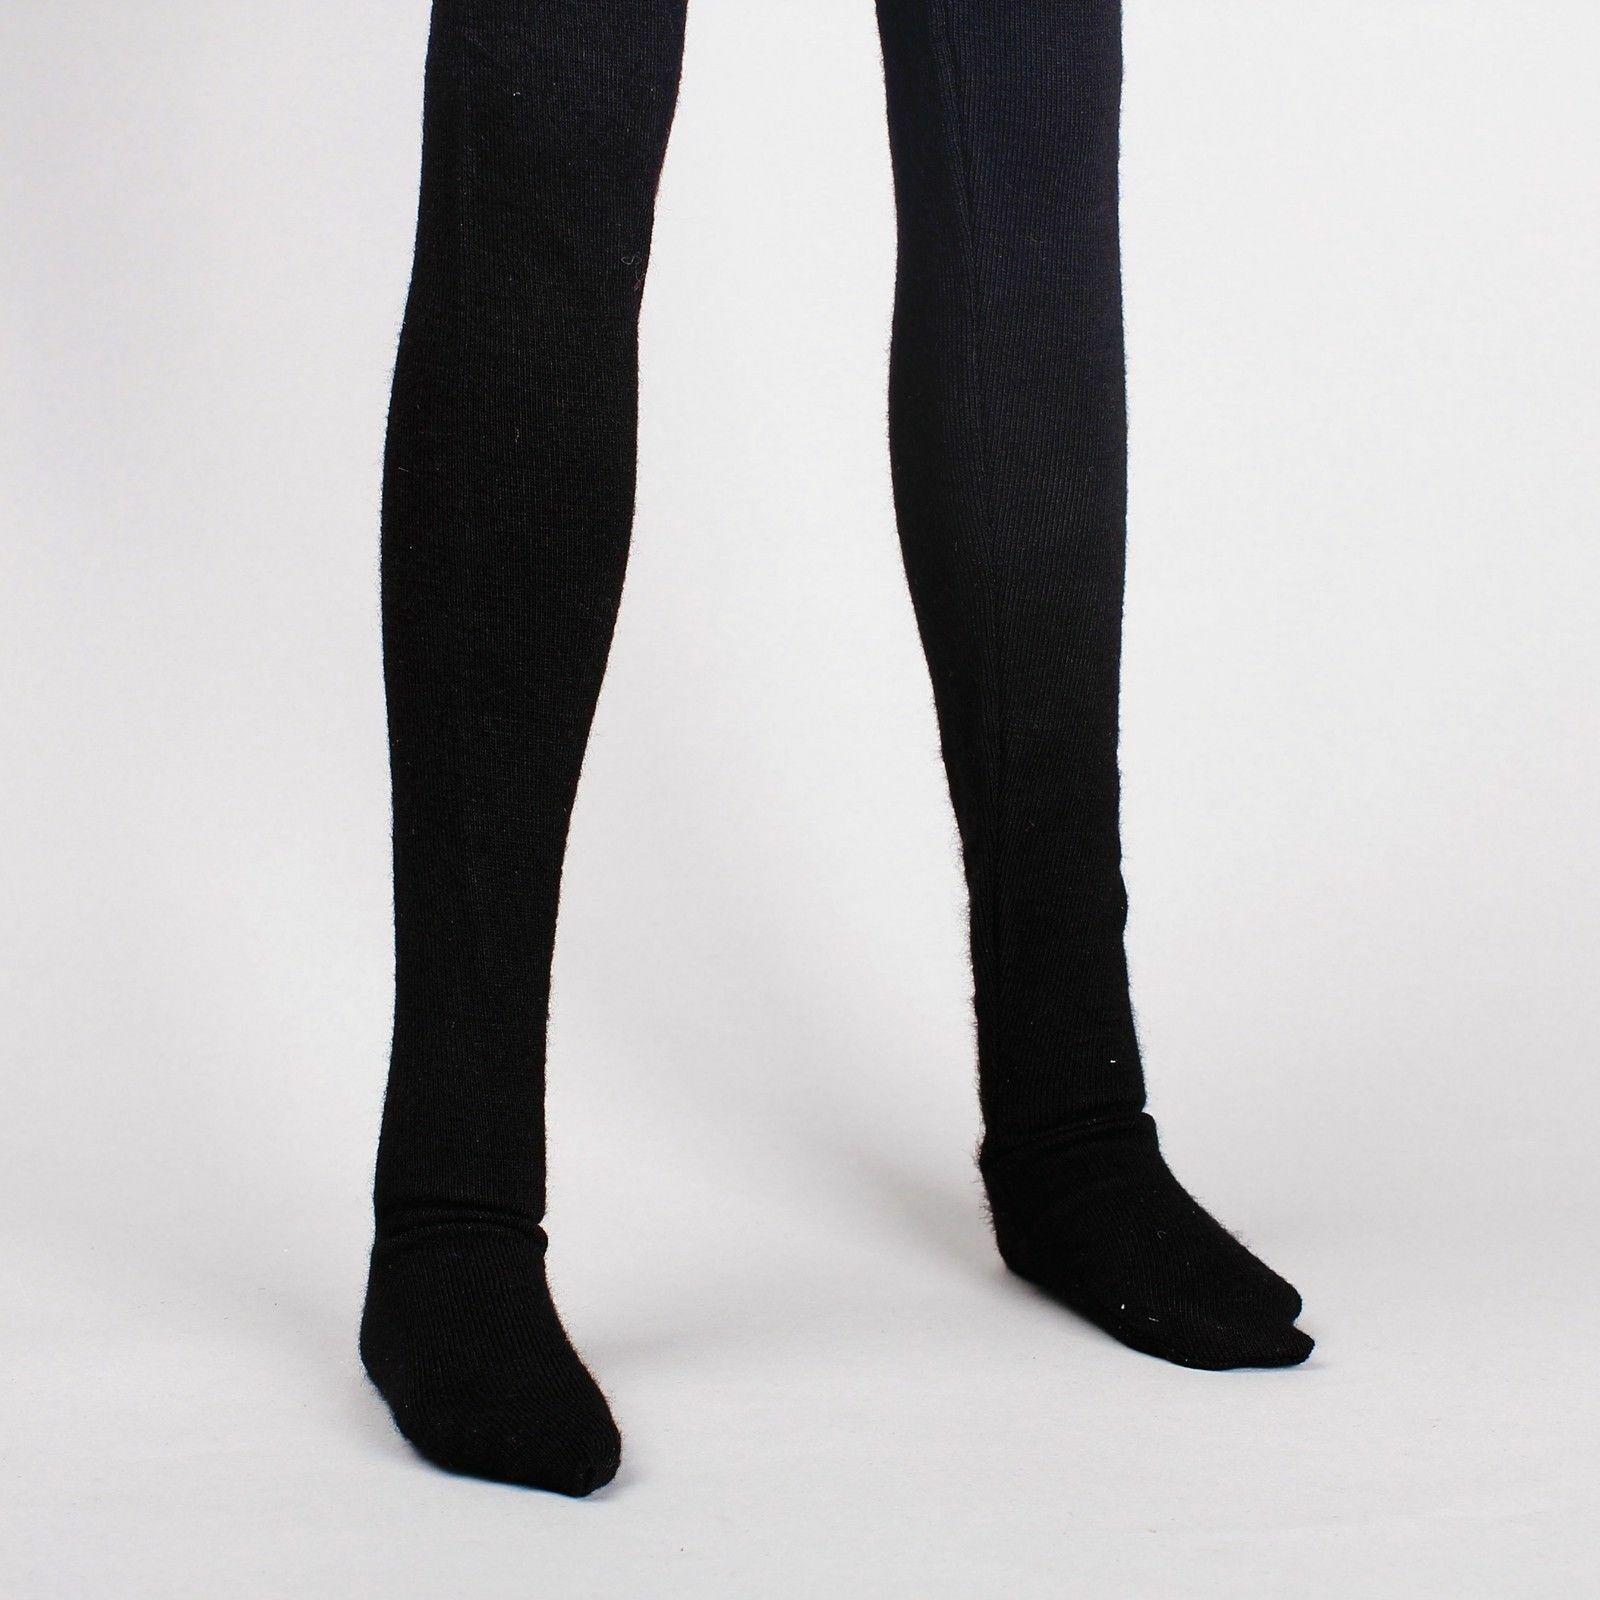 PF 10# Black Trousers Stockings Clothes 1//4 MSD DOD AOD DZ BJD Dollfie